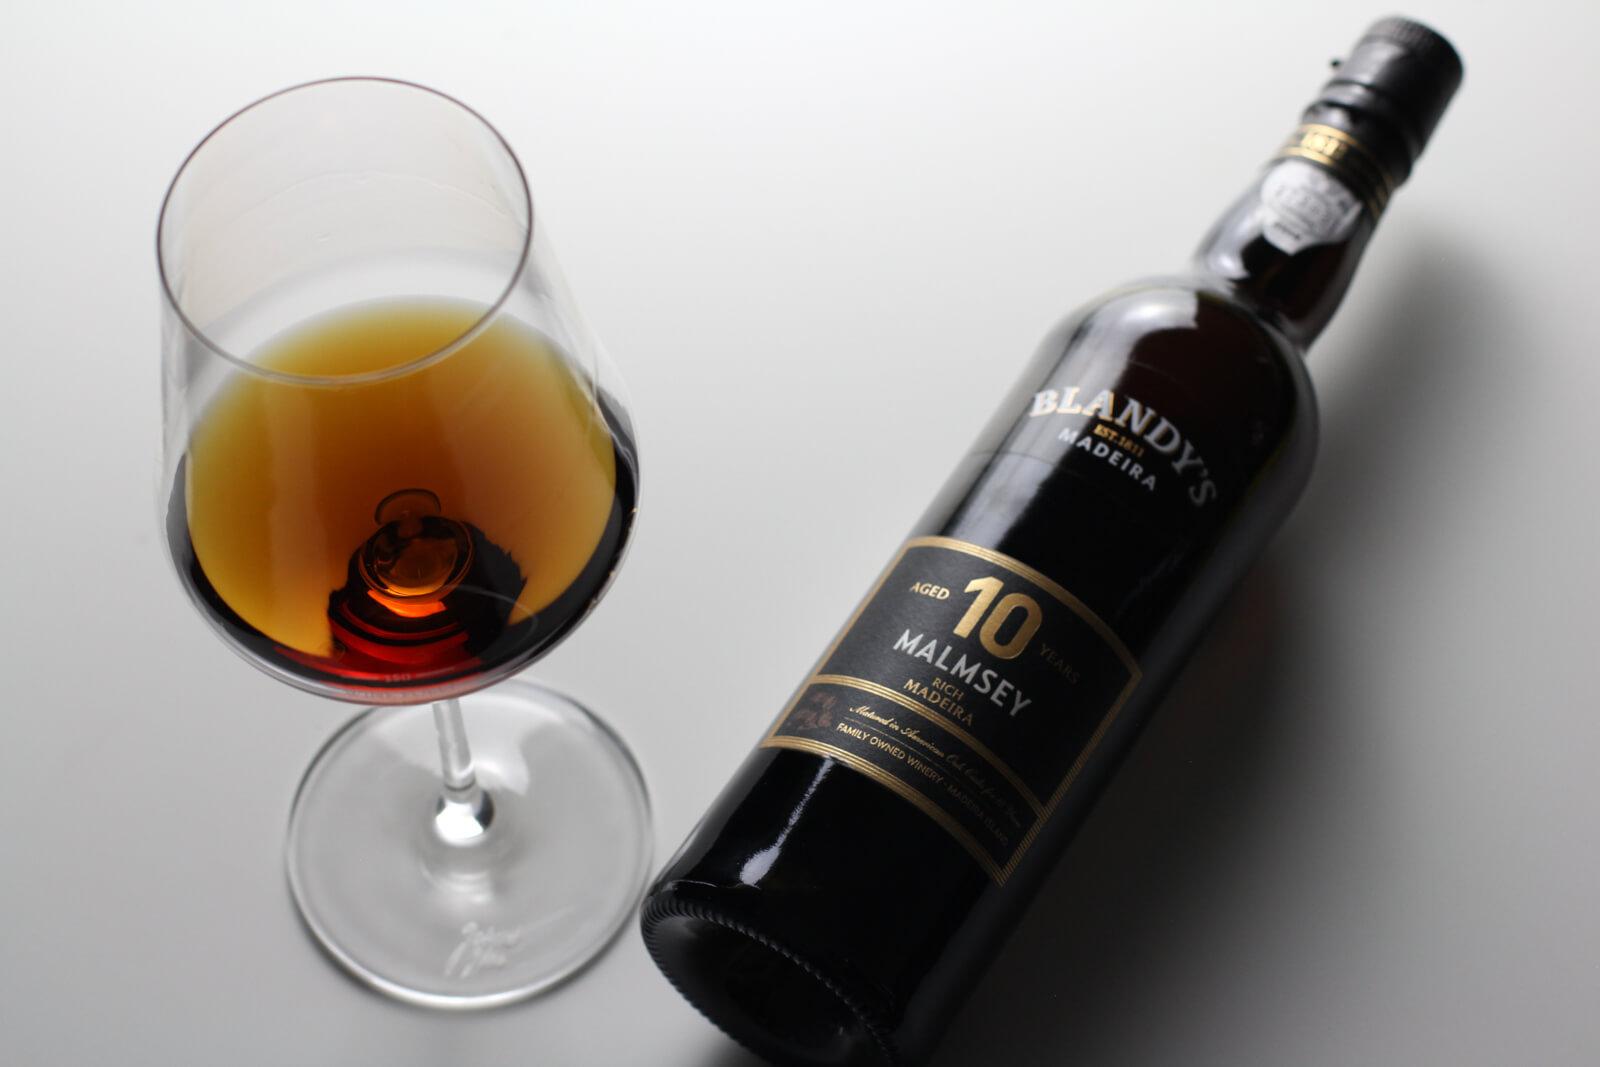 Malmsey-Madeira-Wine-Glass-Blandys-WineFolly